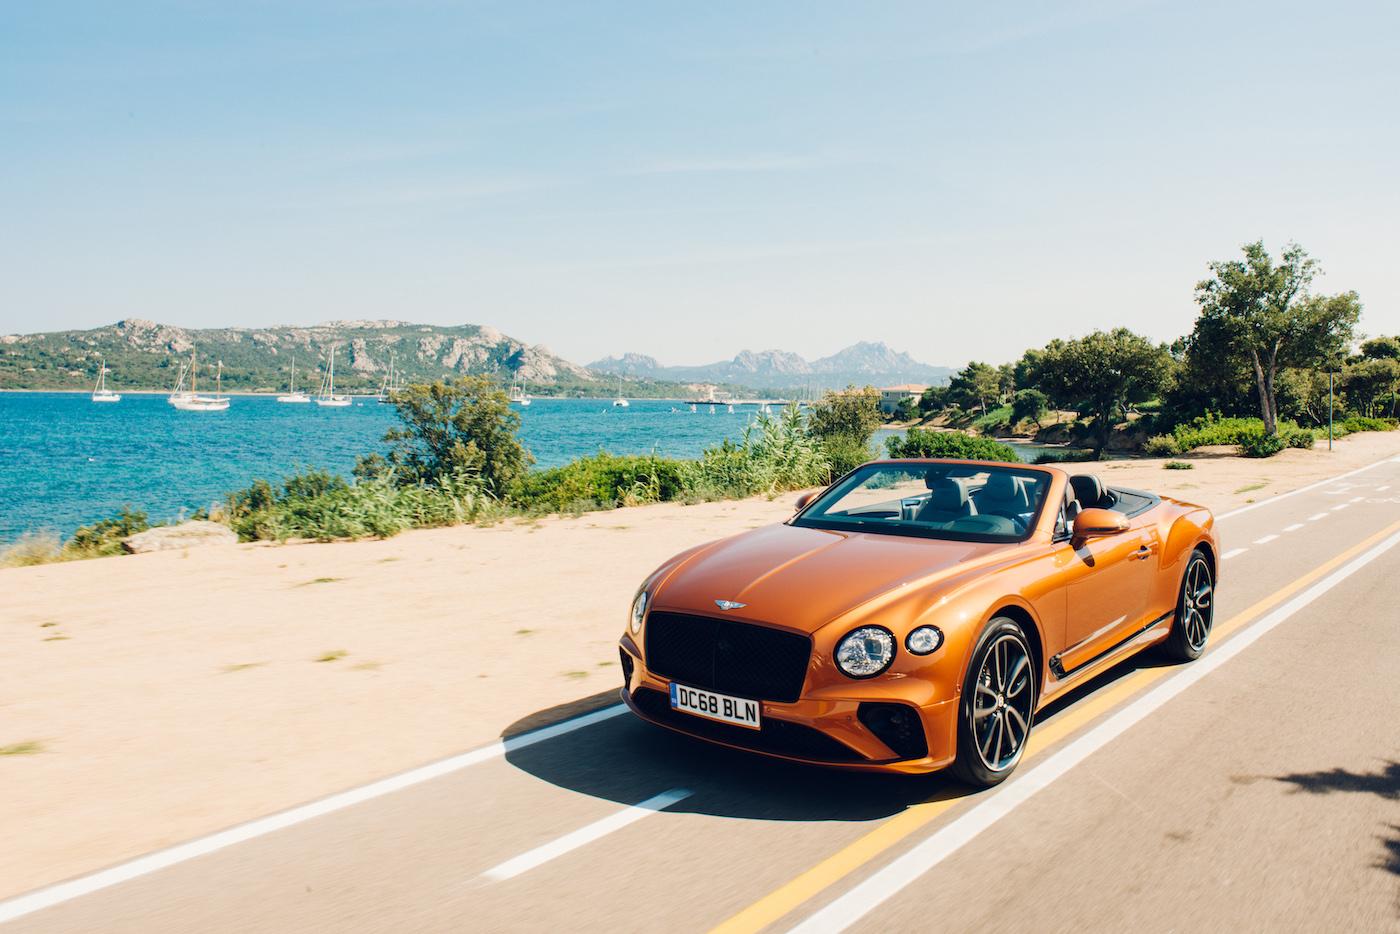 Mit Bentley in Porto Cervo: Die Bentley Summer Tour 2019 7